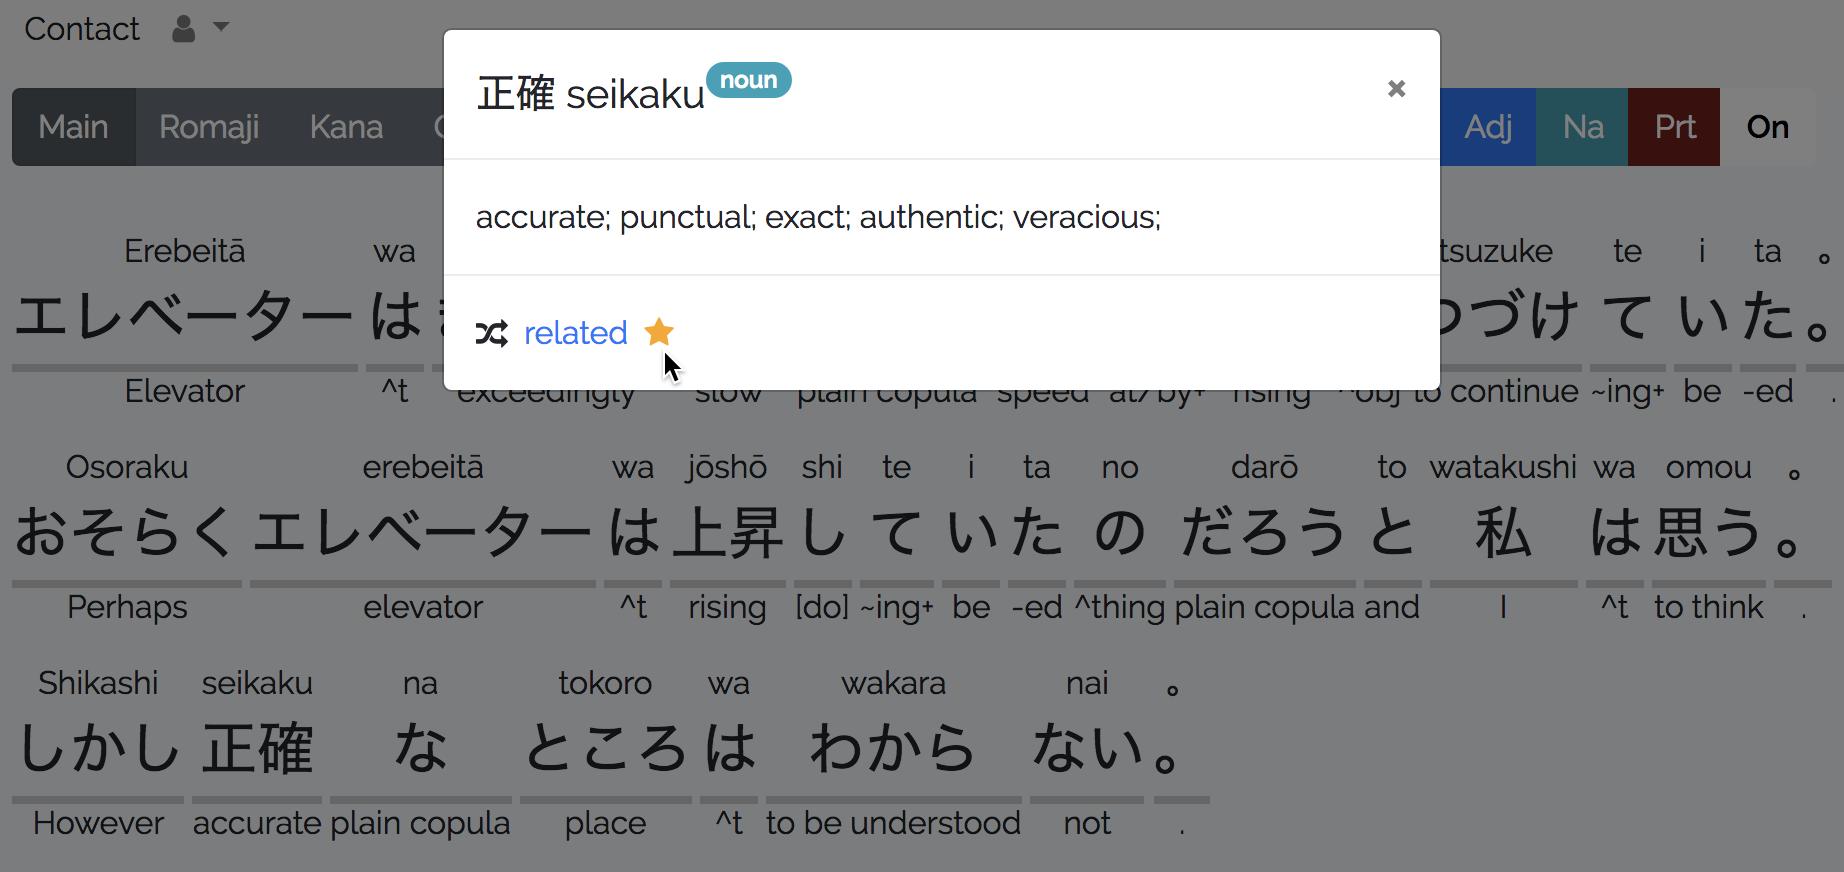 Kanji Romaji Hiragana Convert